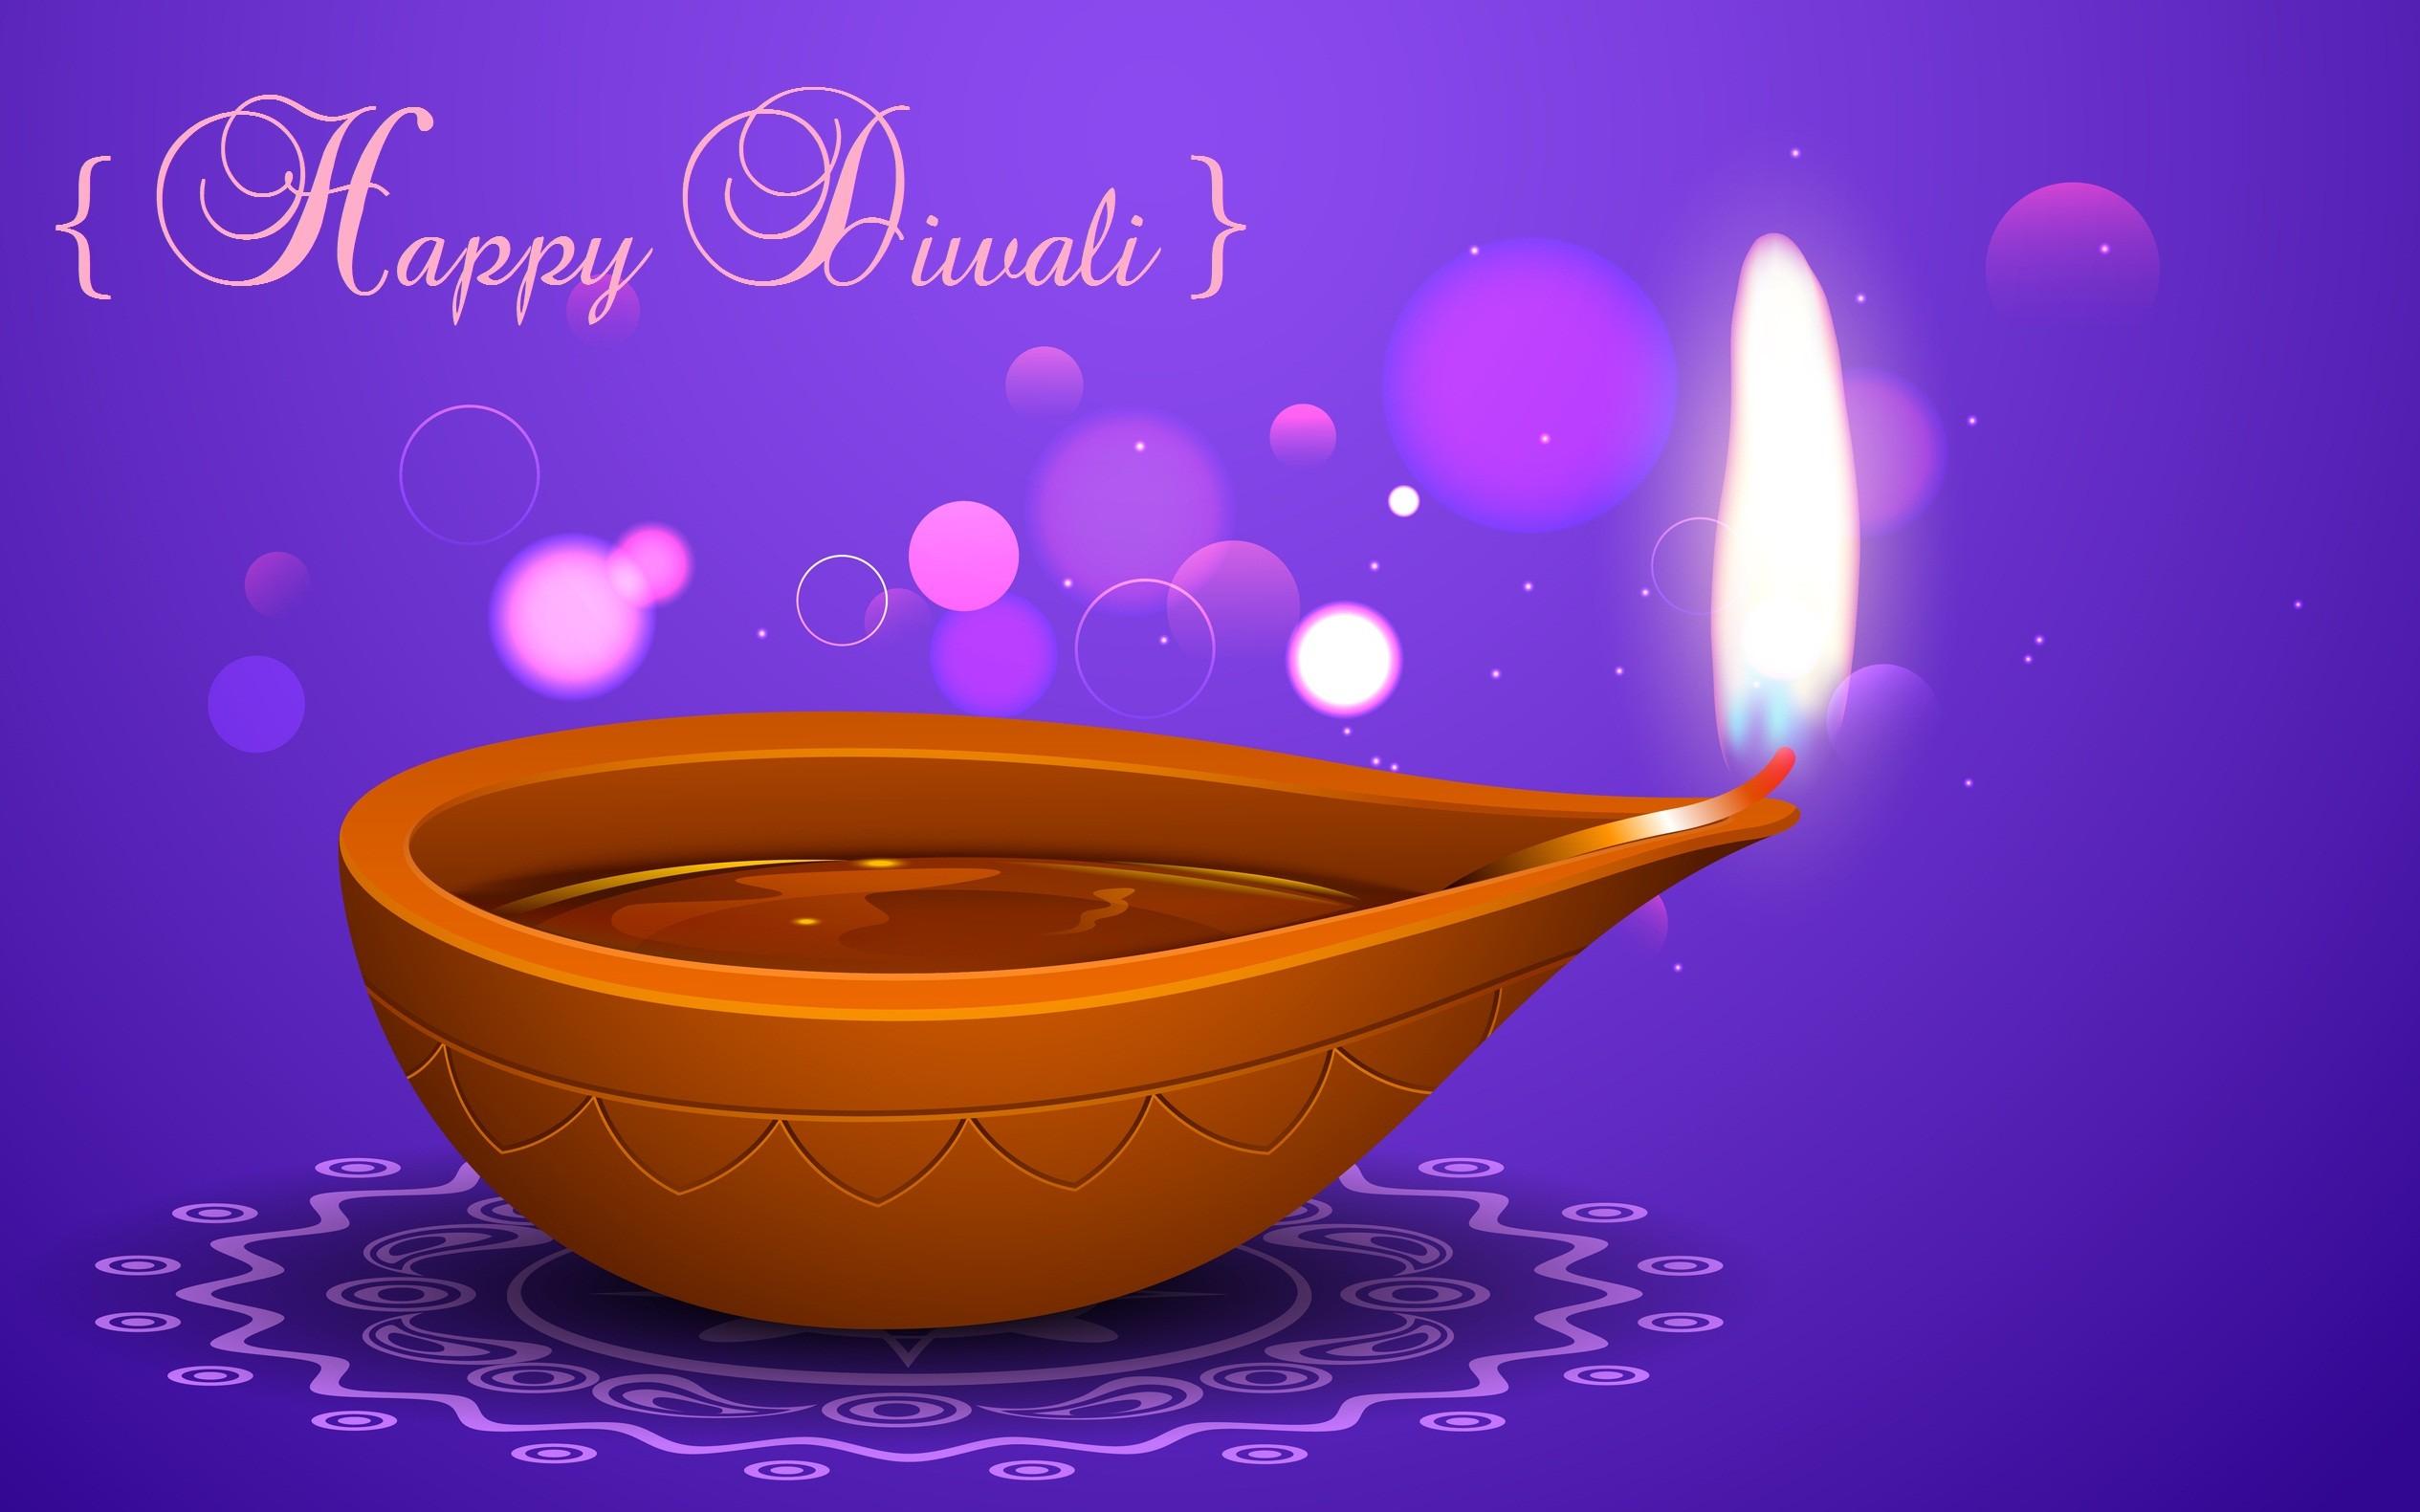 Top 100 Happy Diwali Deepavali 2017 Diya Hd Wallpapers Images